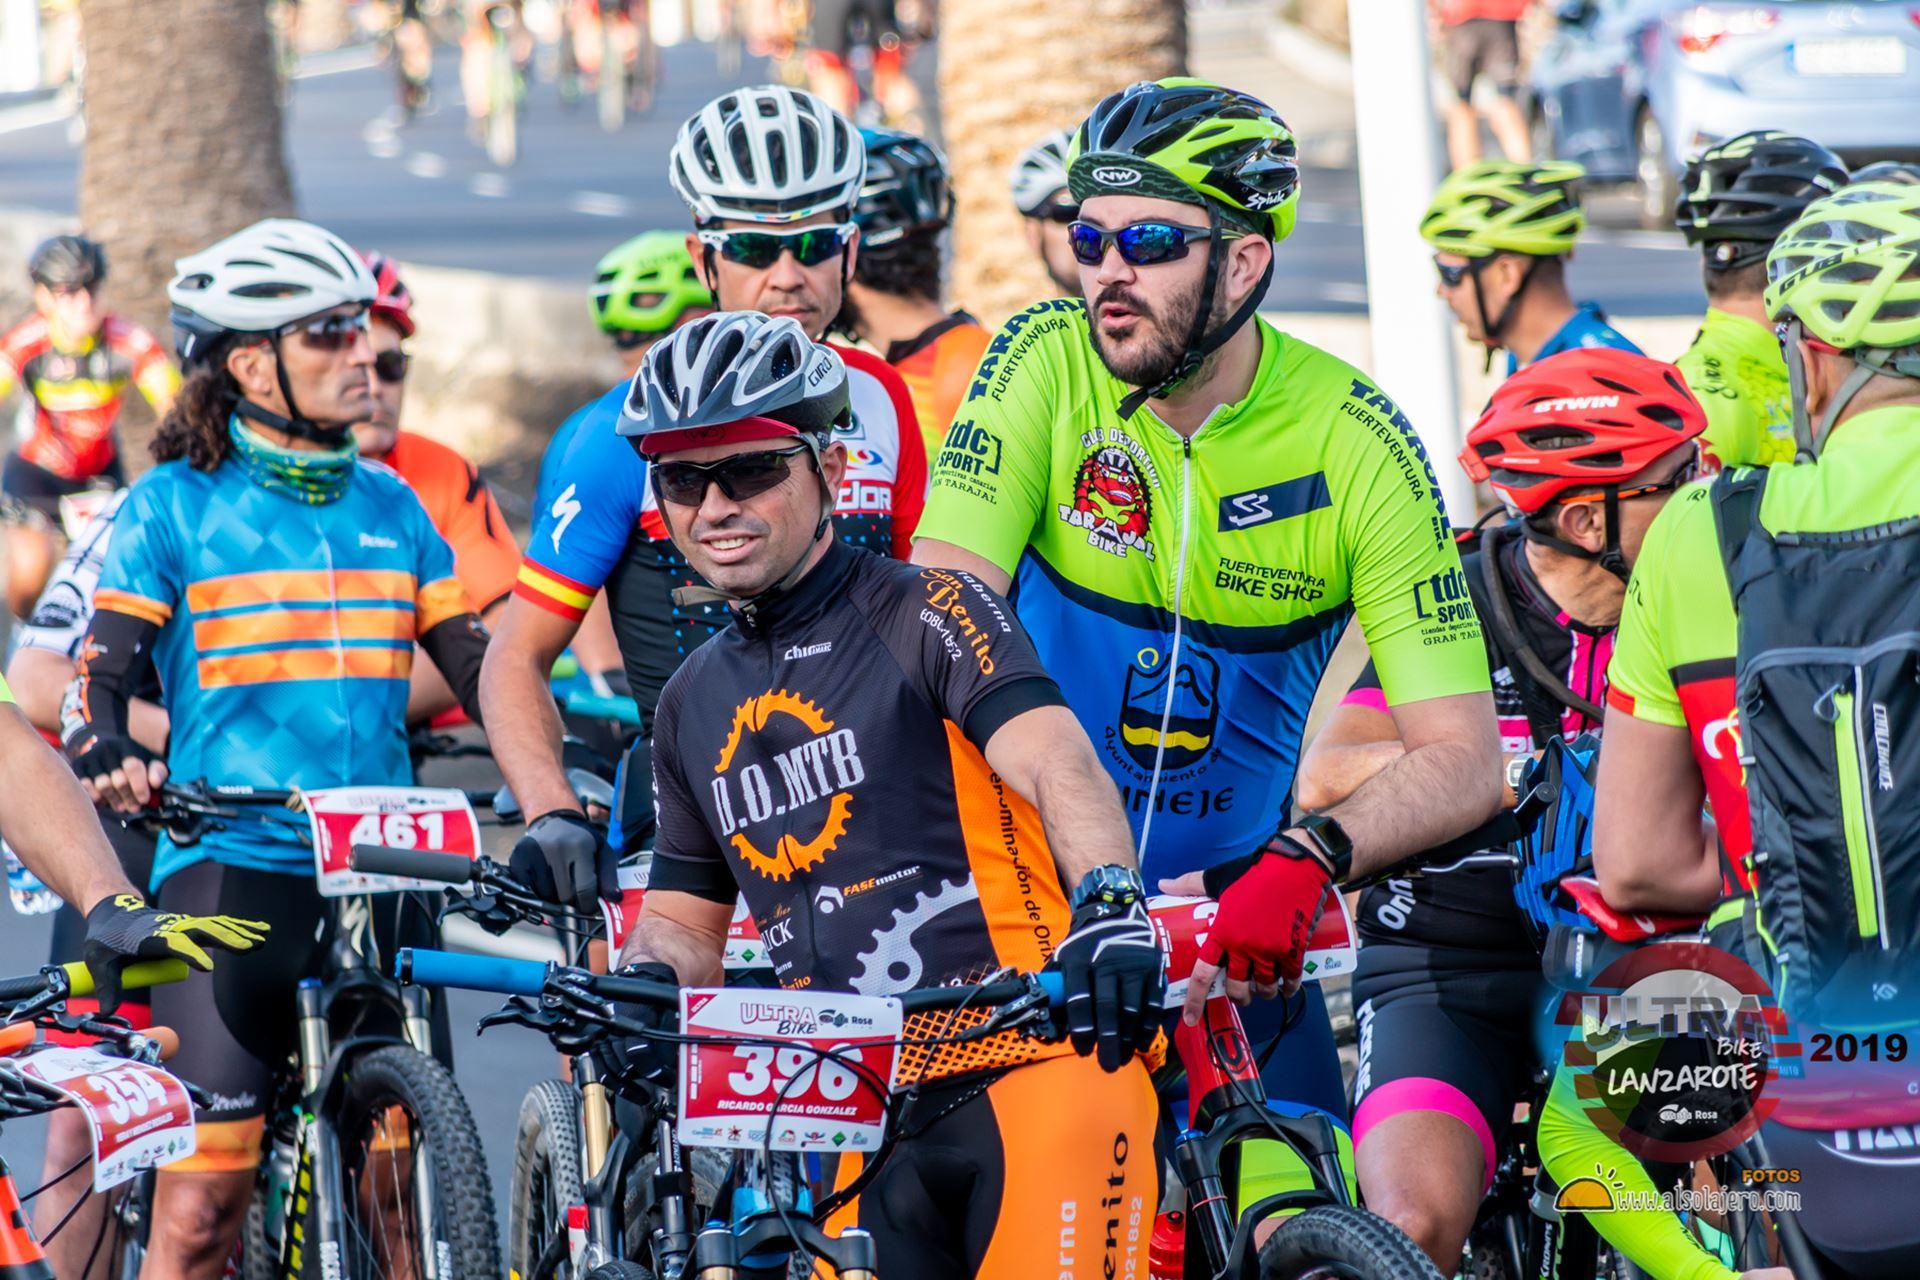 Salida 2ª Etapa Ultrabike 2019 Fotos Alsolajero.com-5